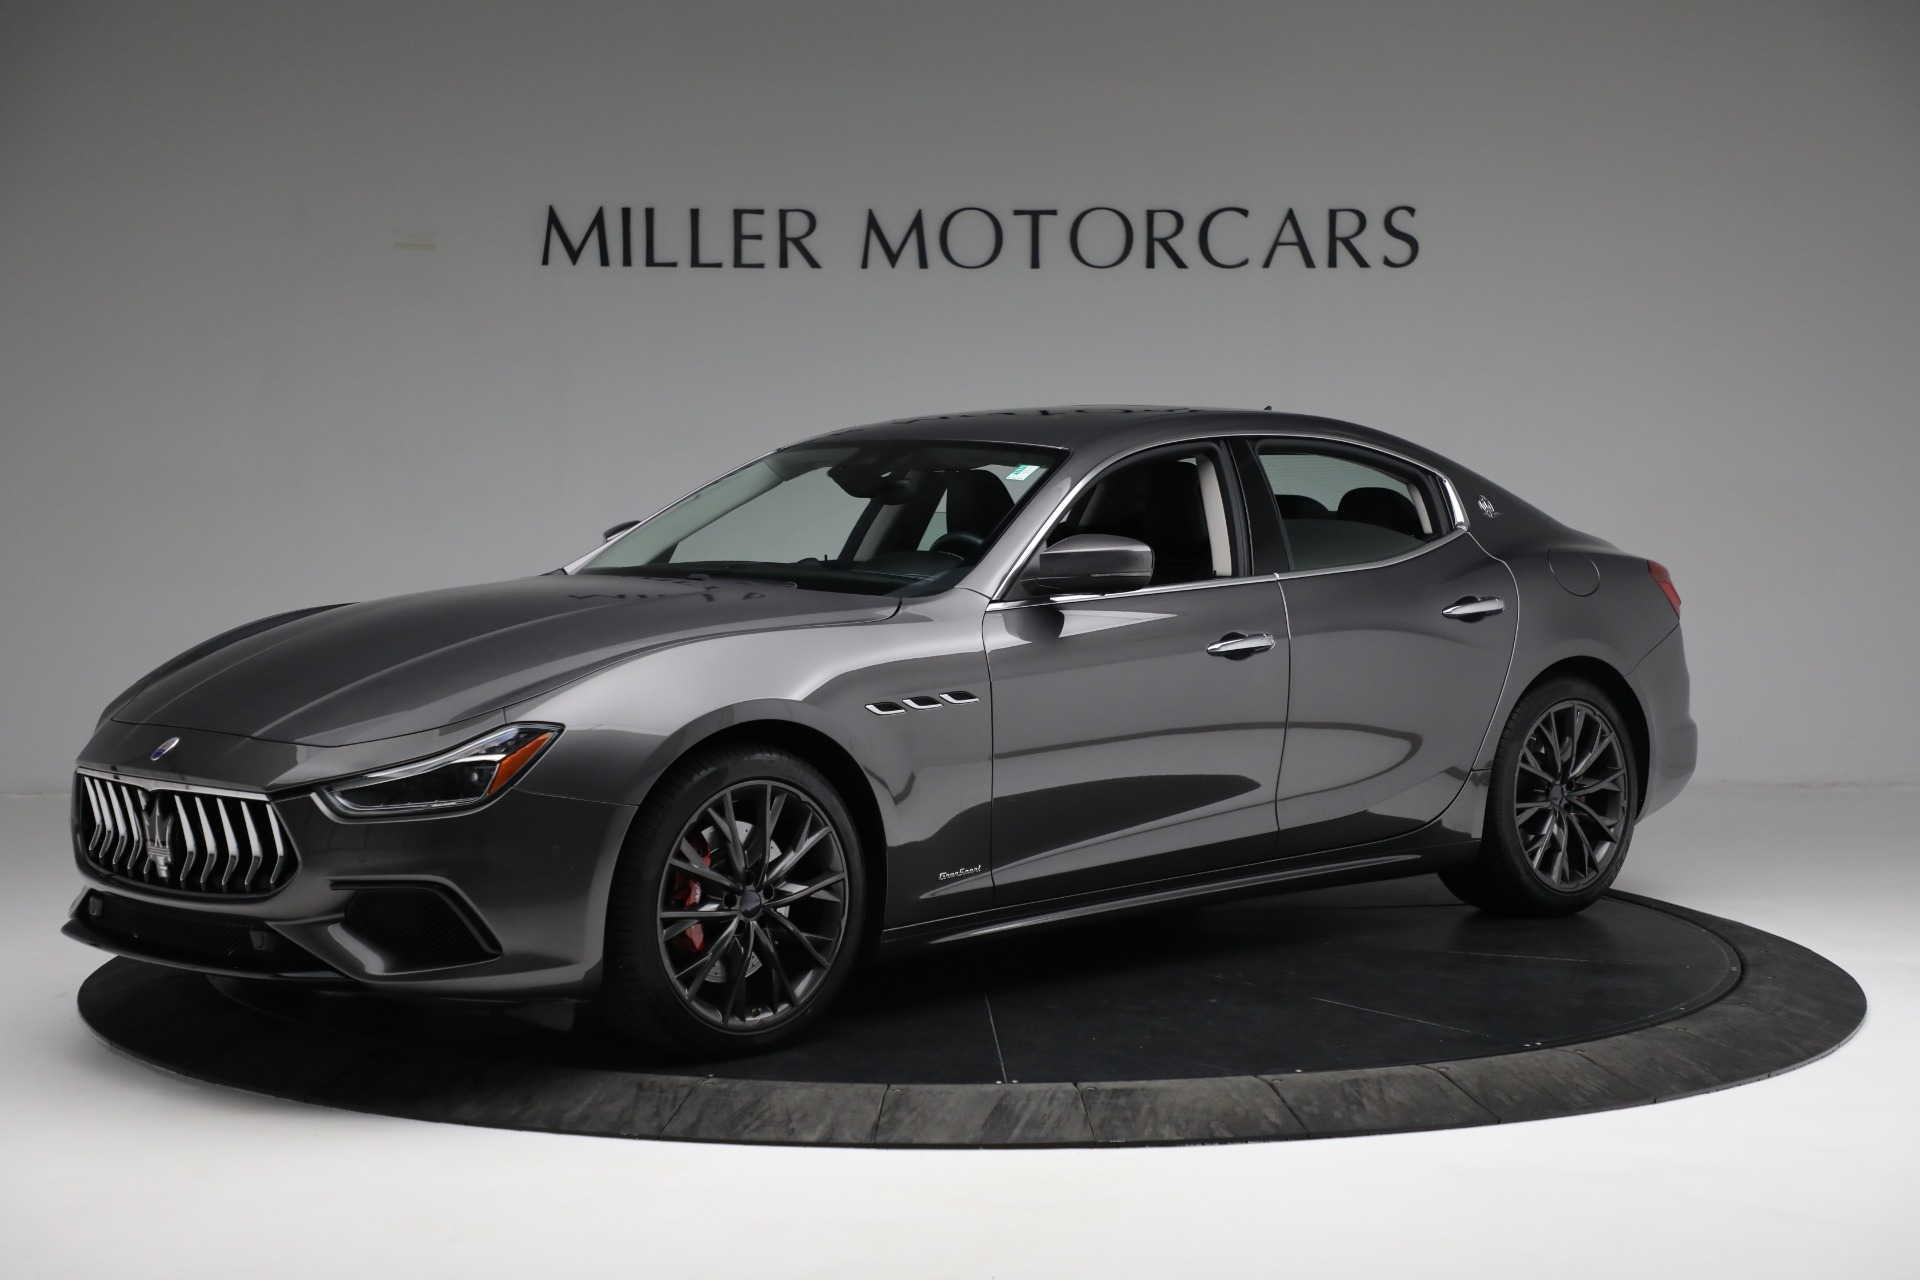 New 2019 Maserati Ghibli S Q4 GranSport For Sale In Greenwich, CT 3493_p2